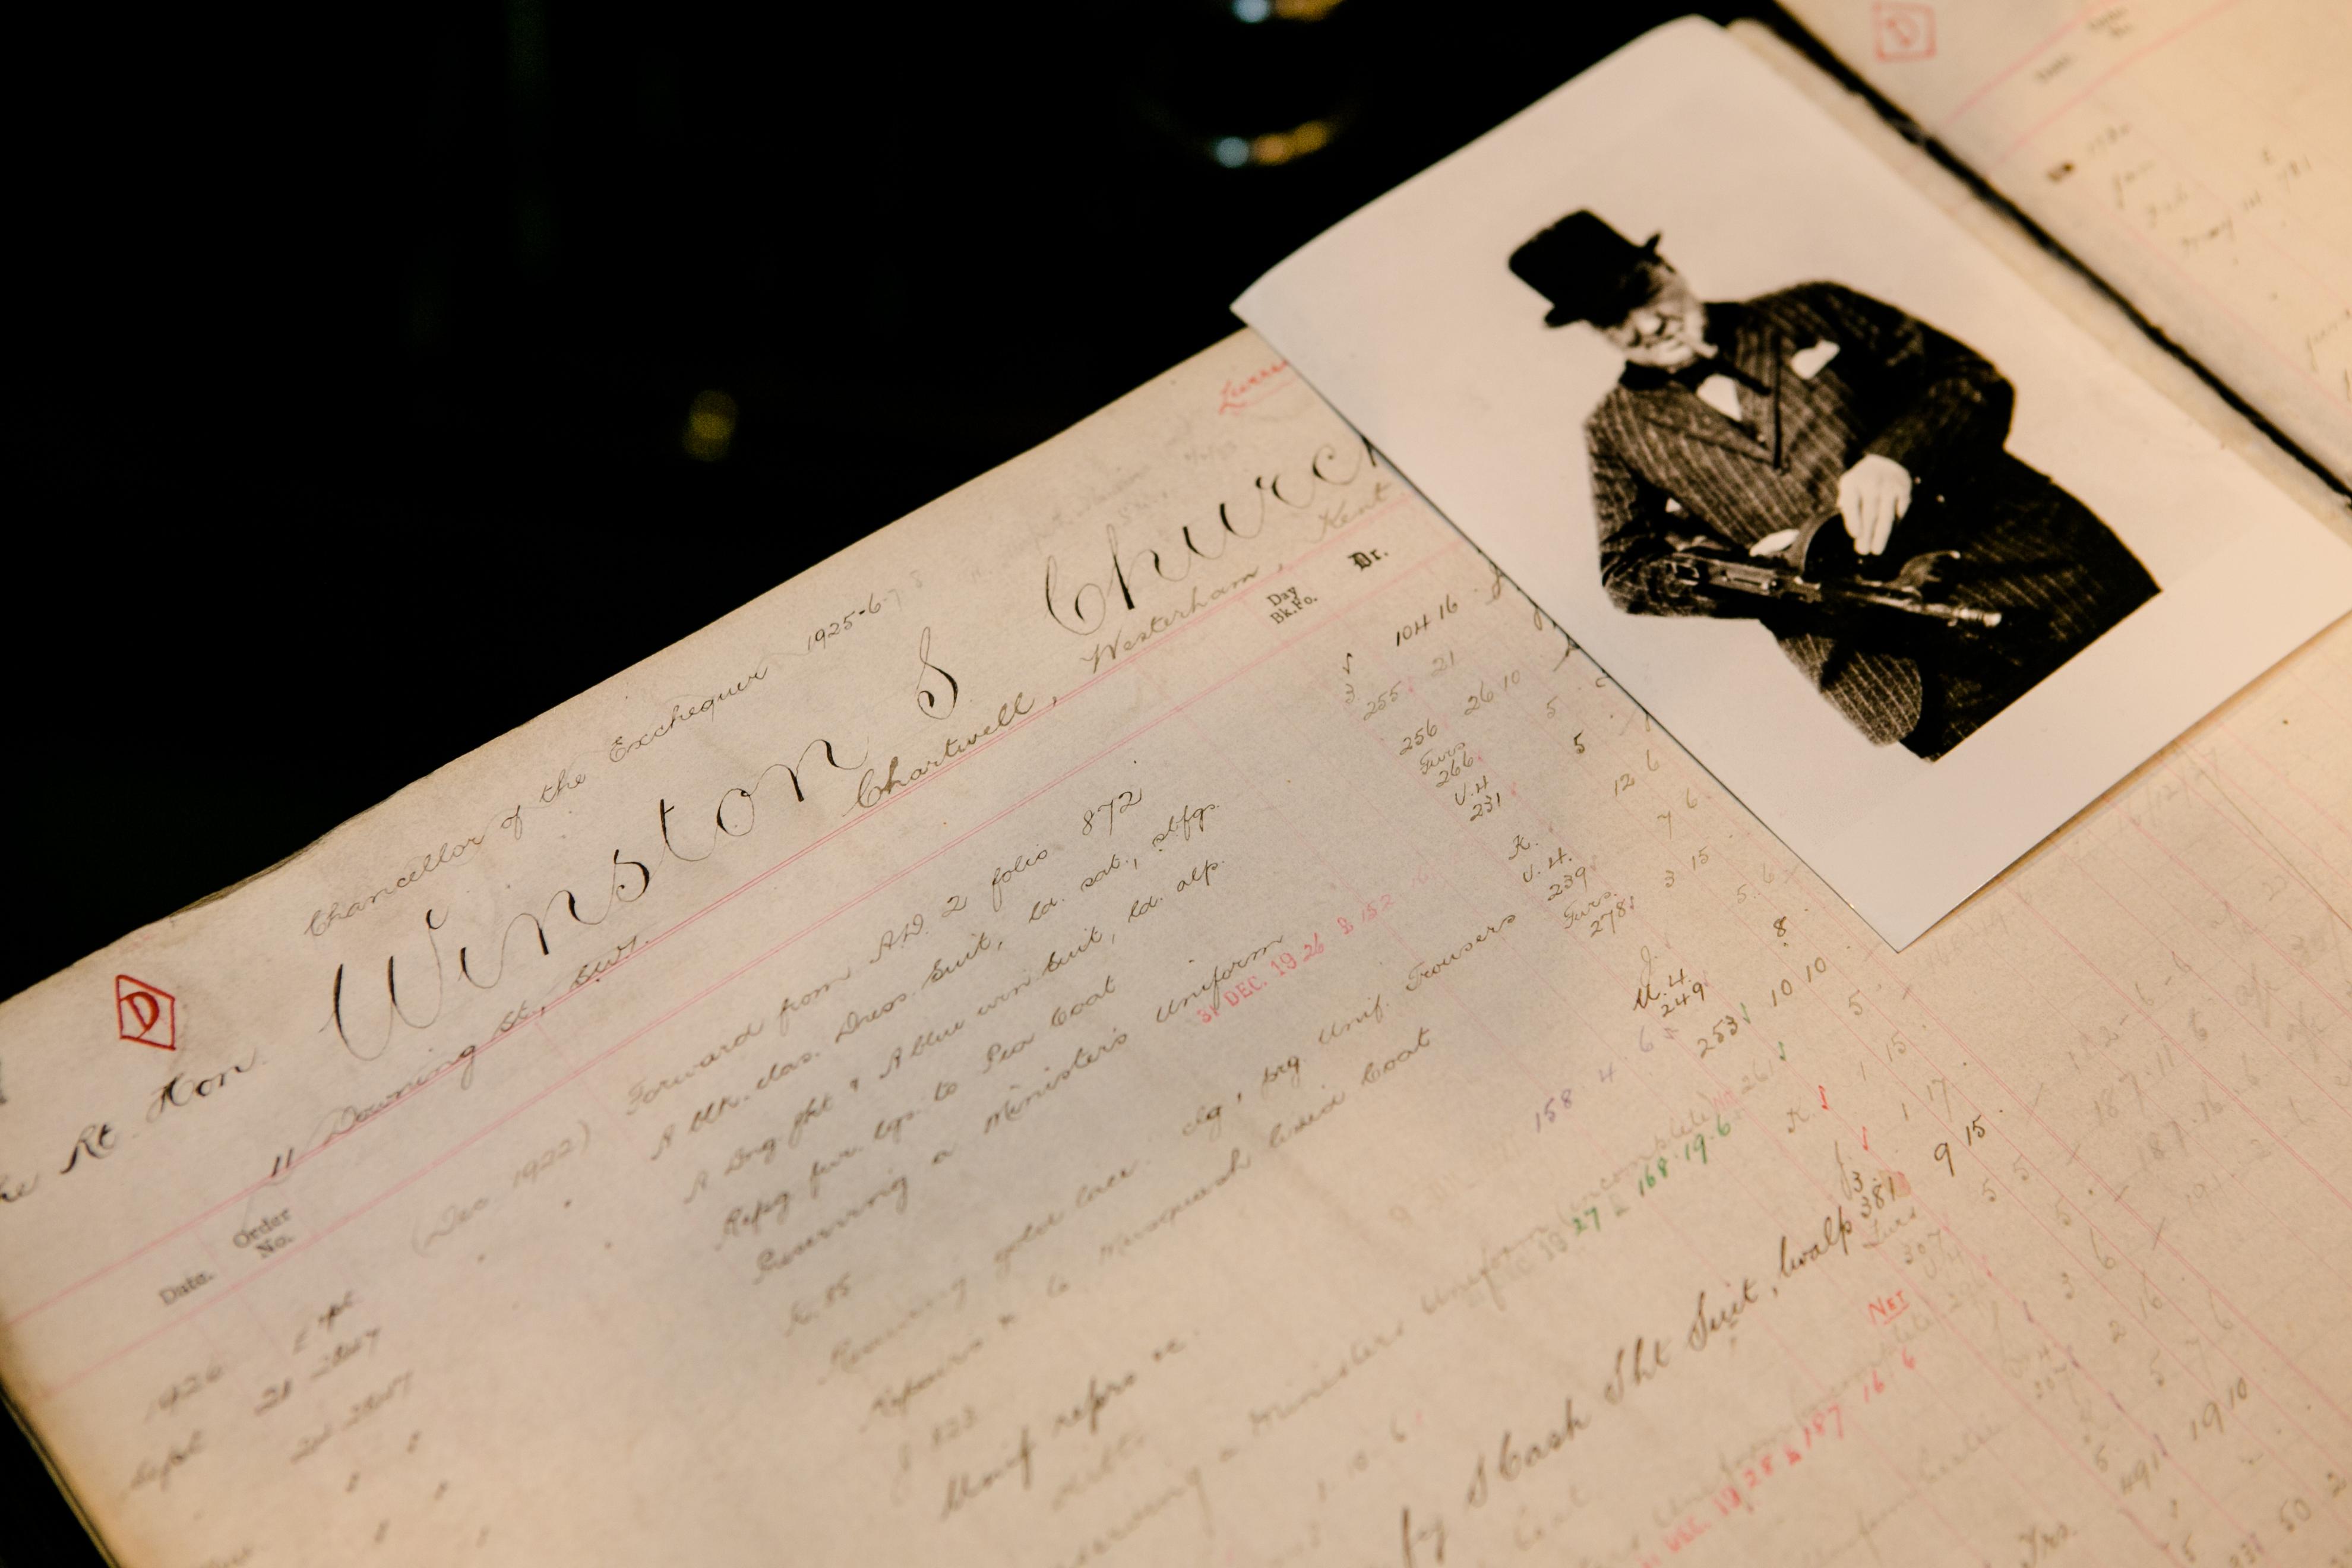 Archive opening Winston Churchill